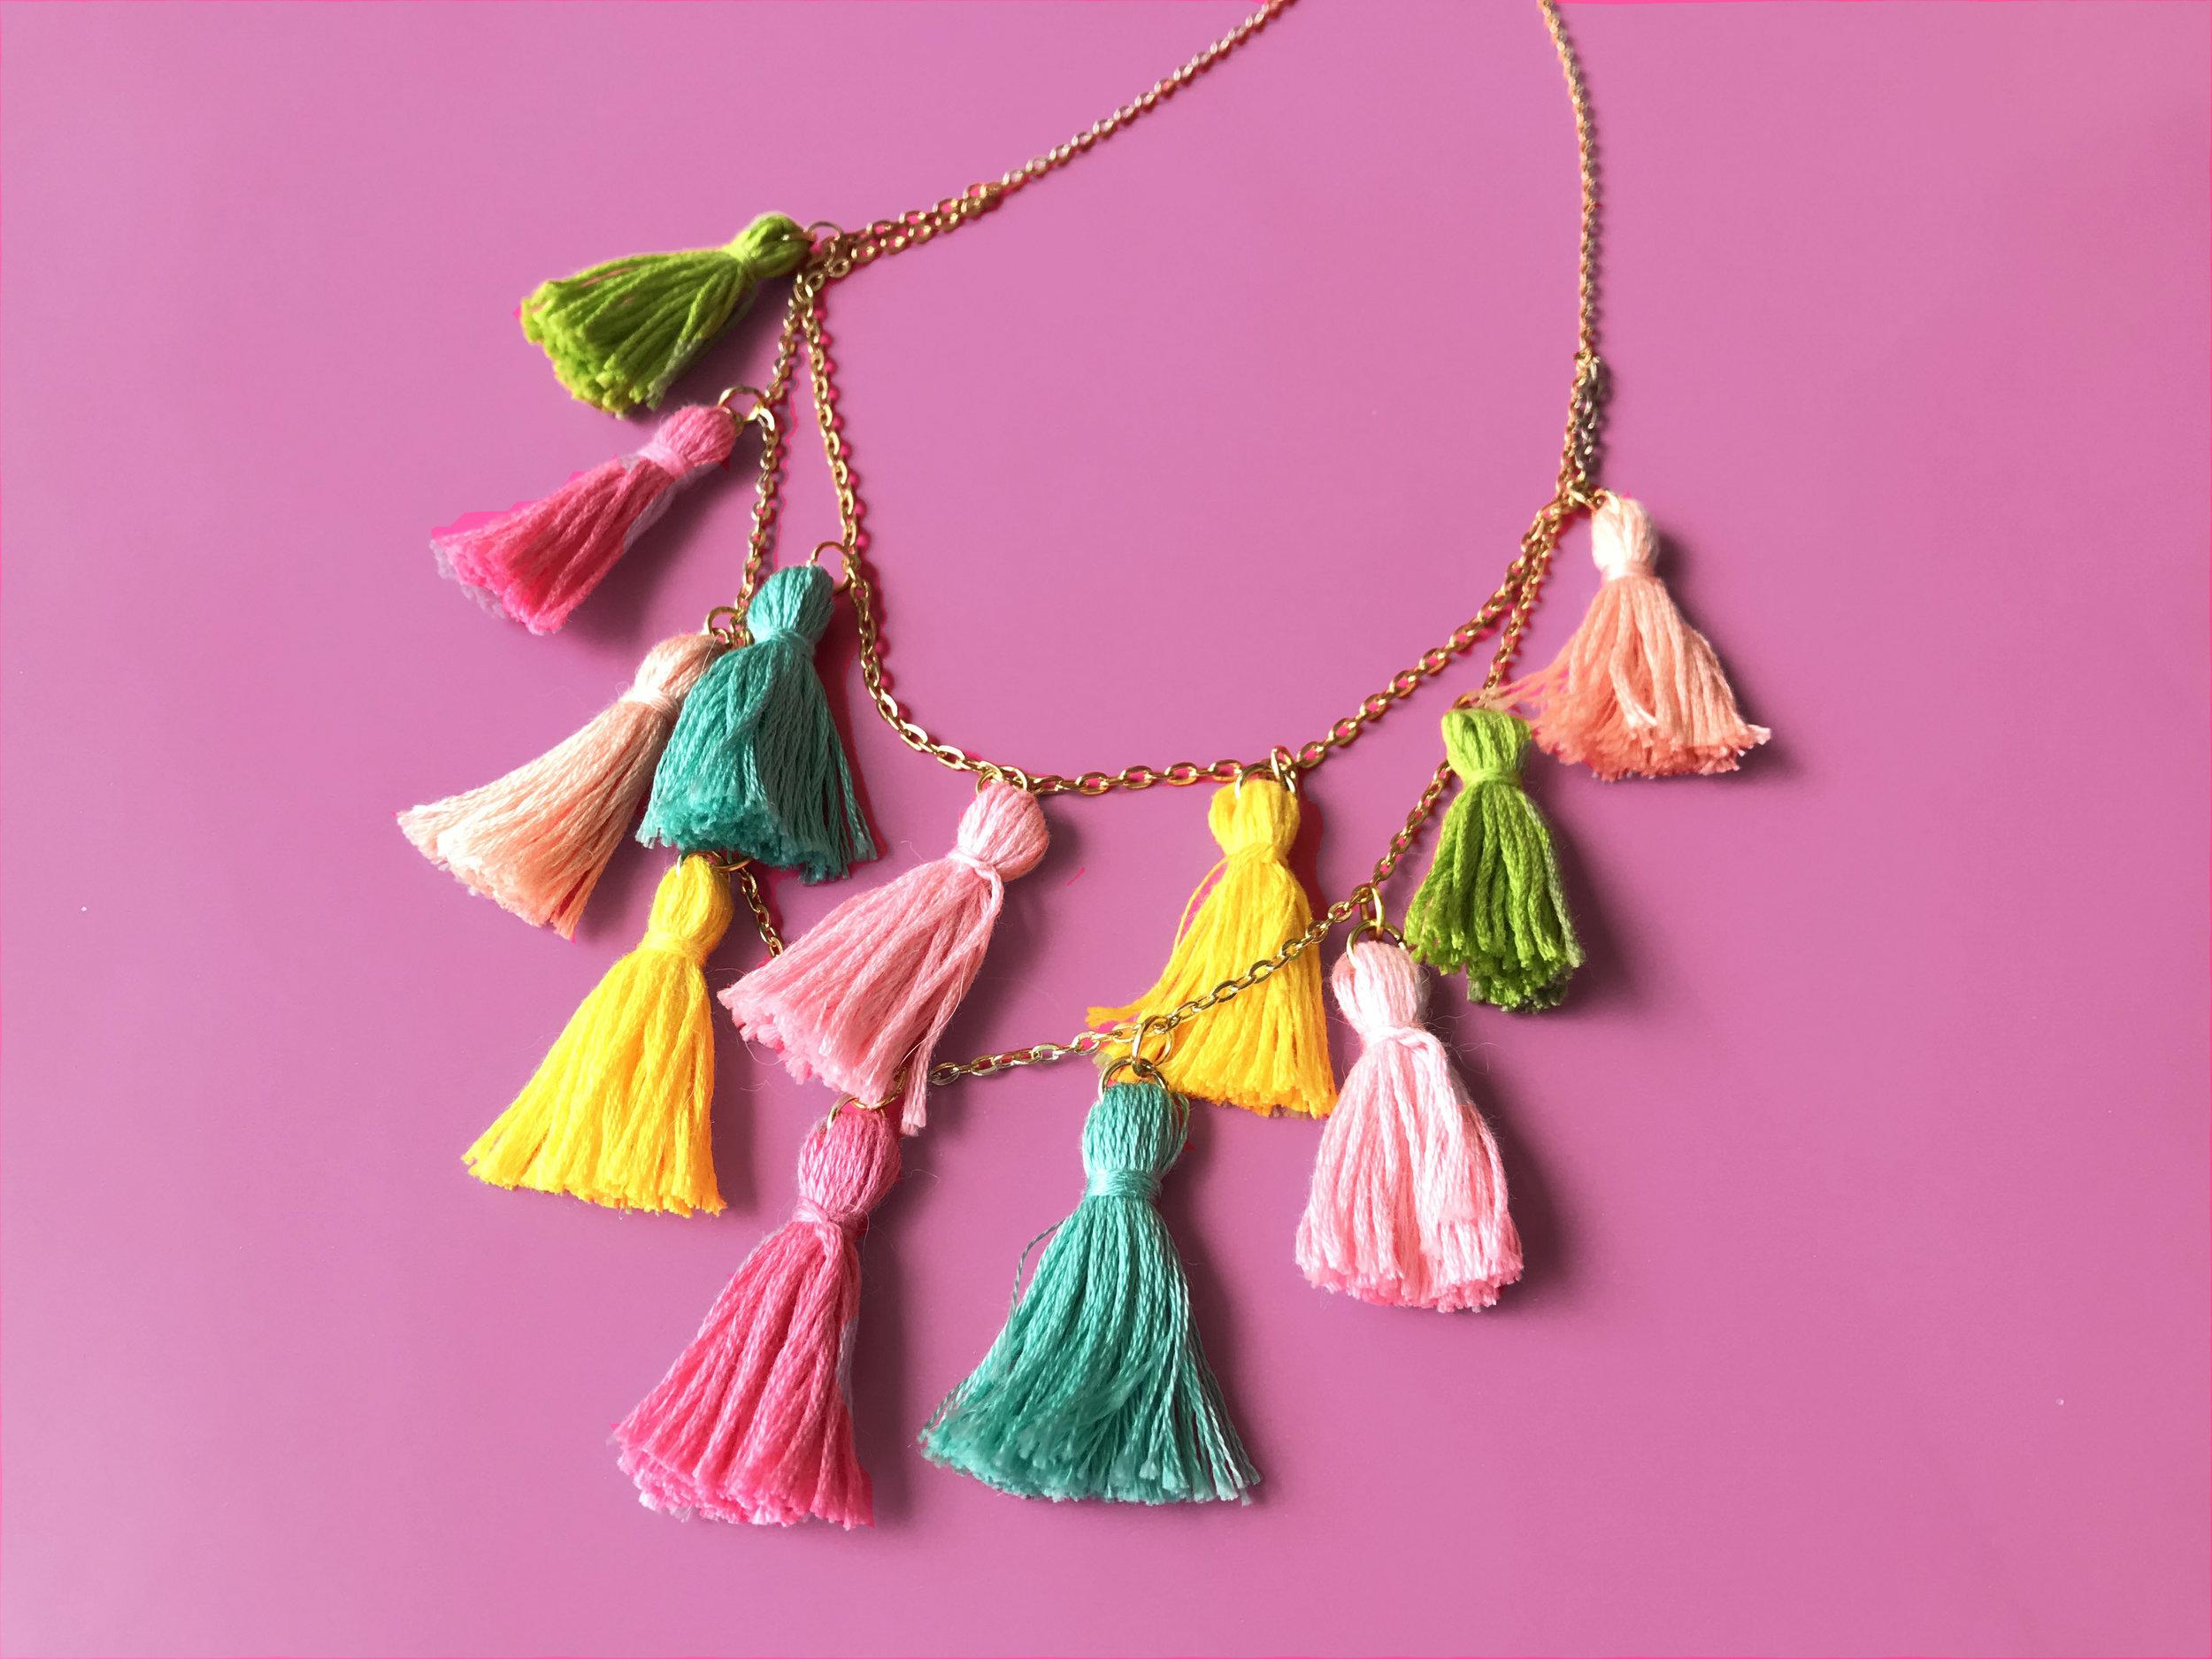 Tassel Necklace.jpg